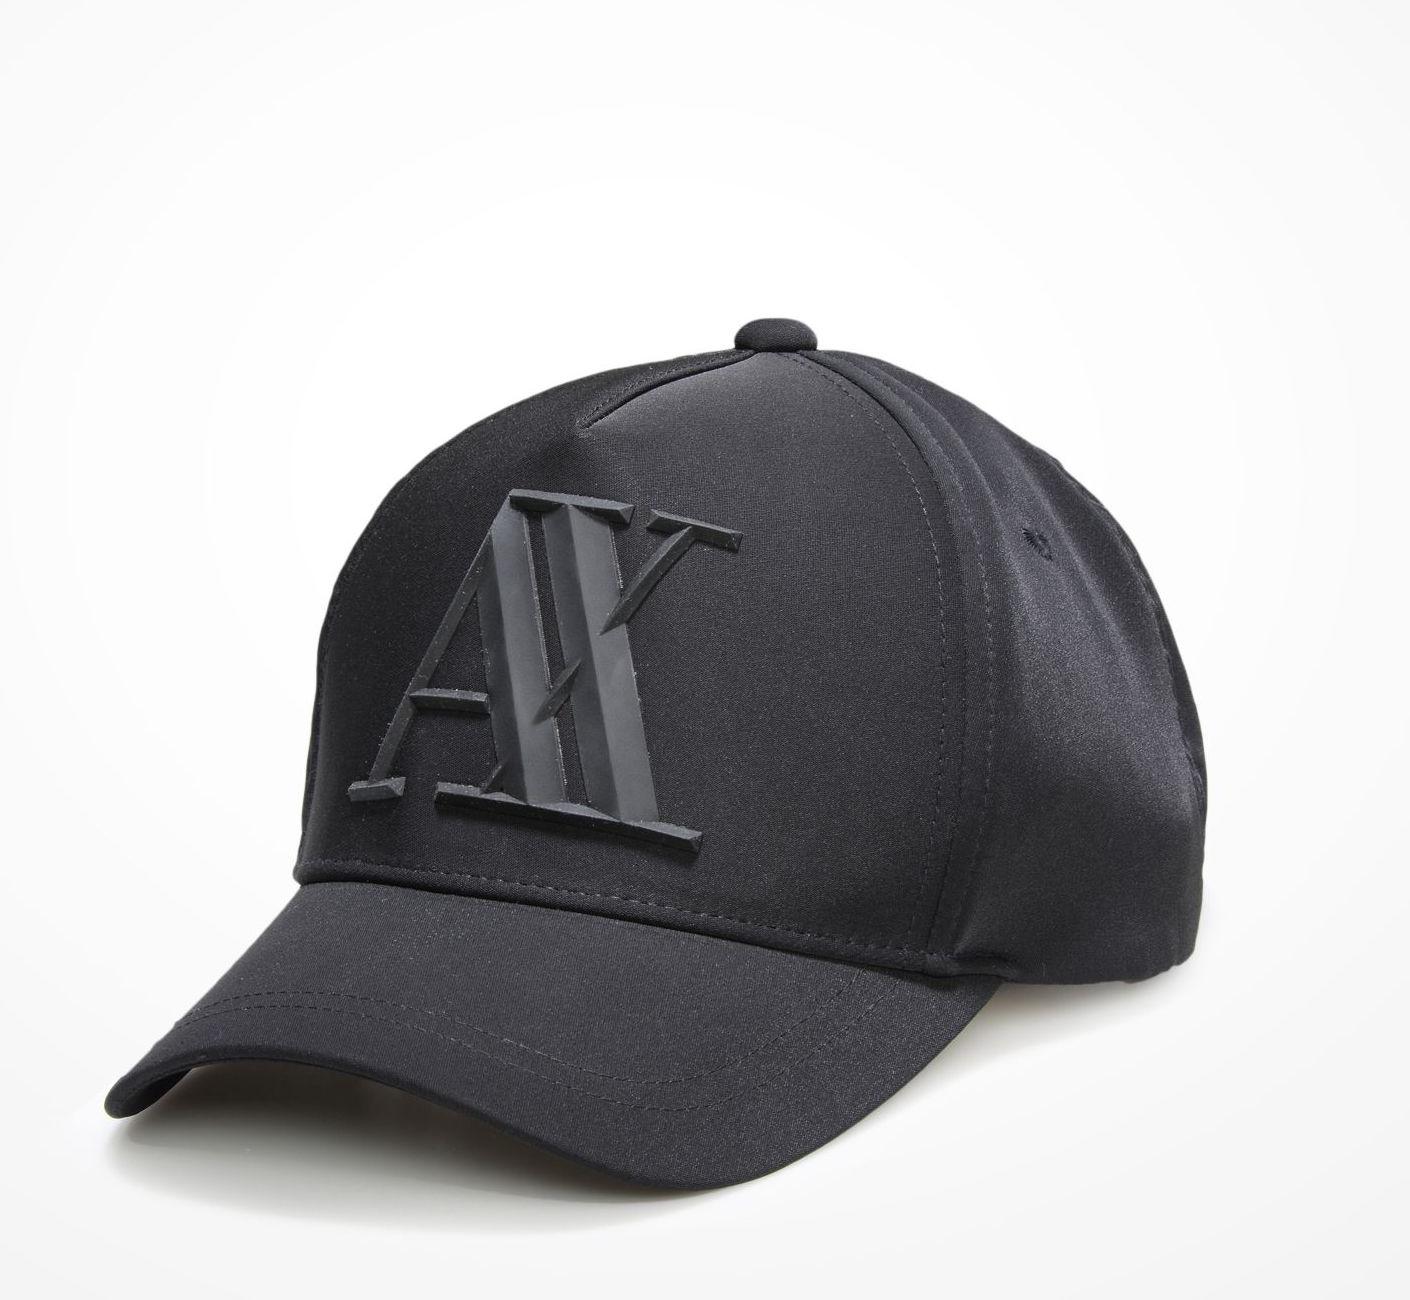 Boné Armani Exchange Rubber Ax Hat Preto - EuEnvio Importados ... 0ad95be562639